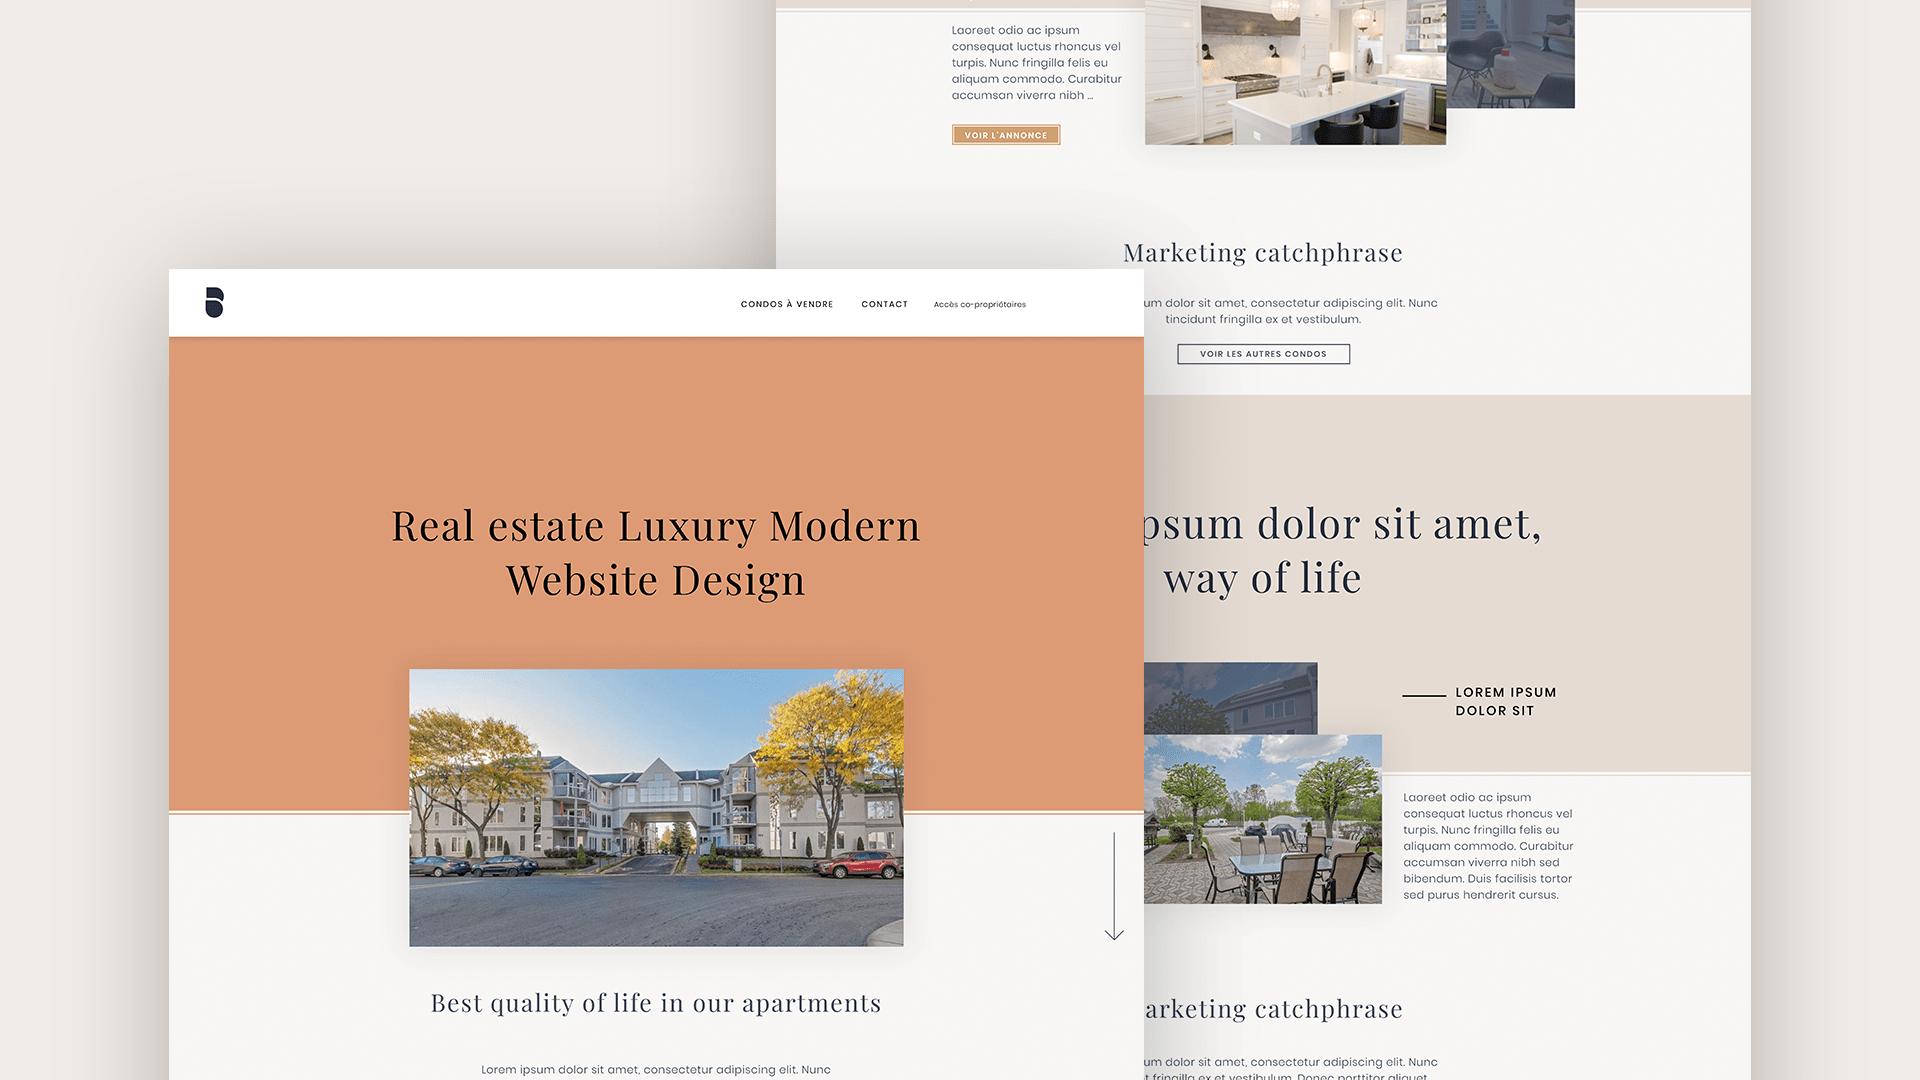 real-estate-luxury-modern-website-design